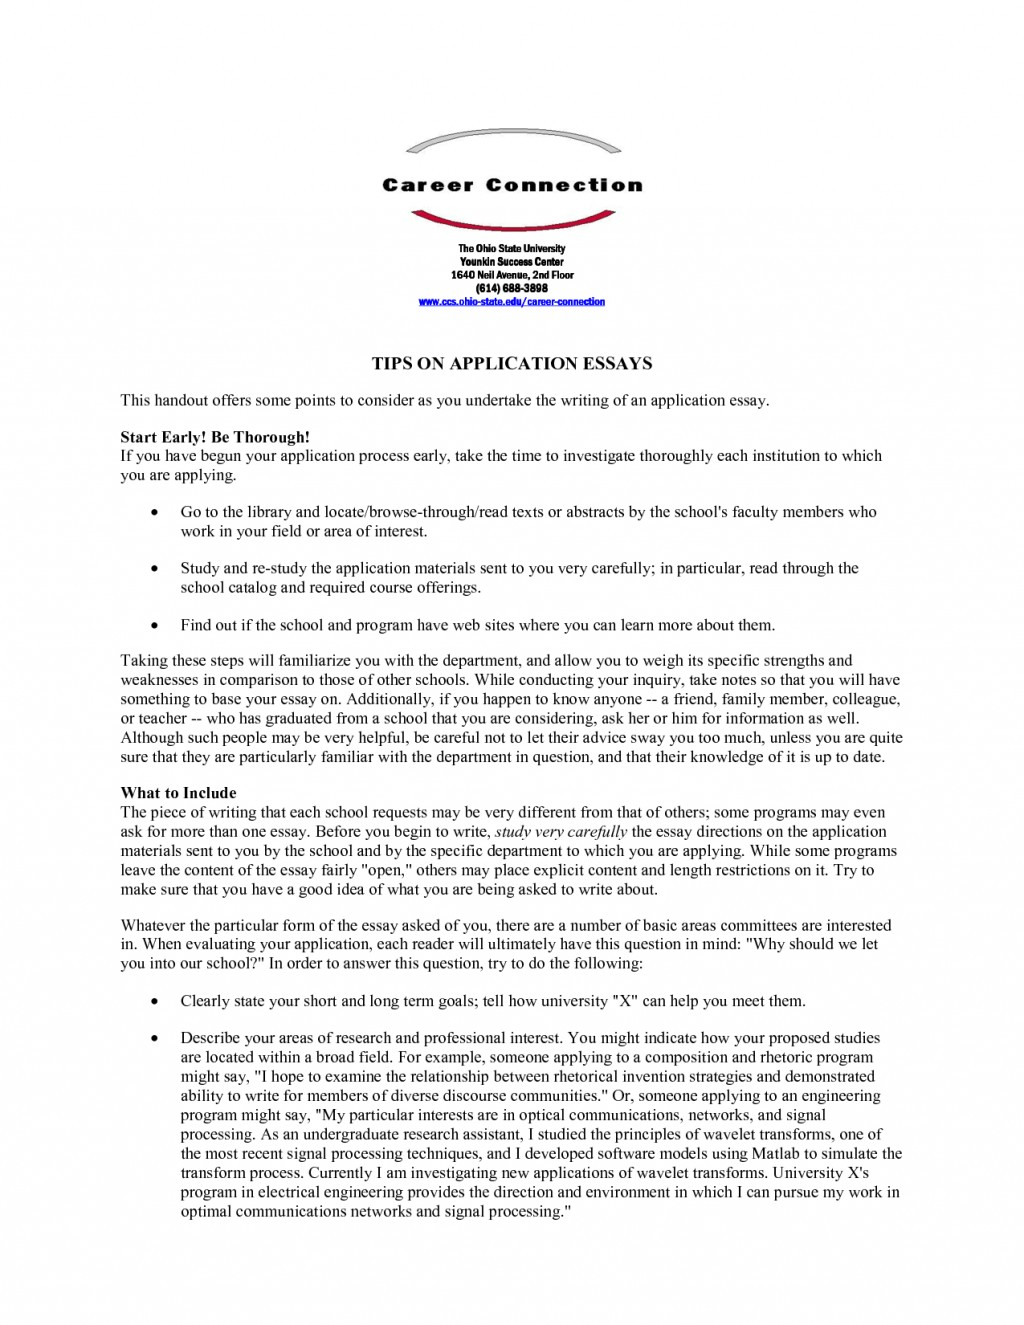 005 Vcu Personal Statement Essay Gb6xryqqsc Remarkable Large